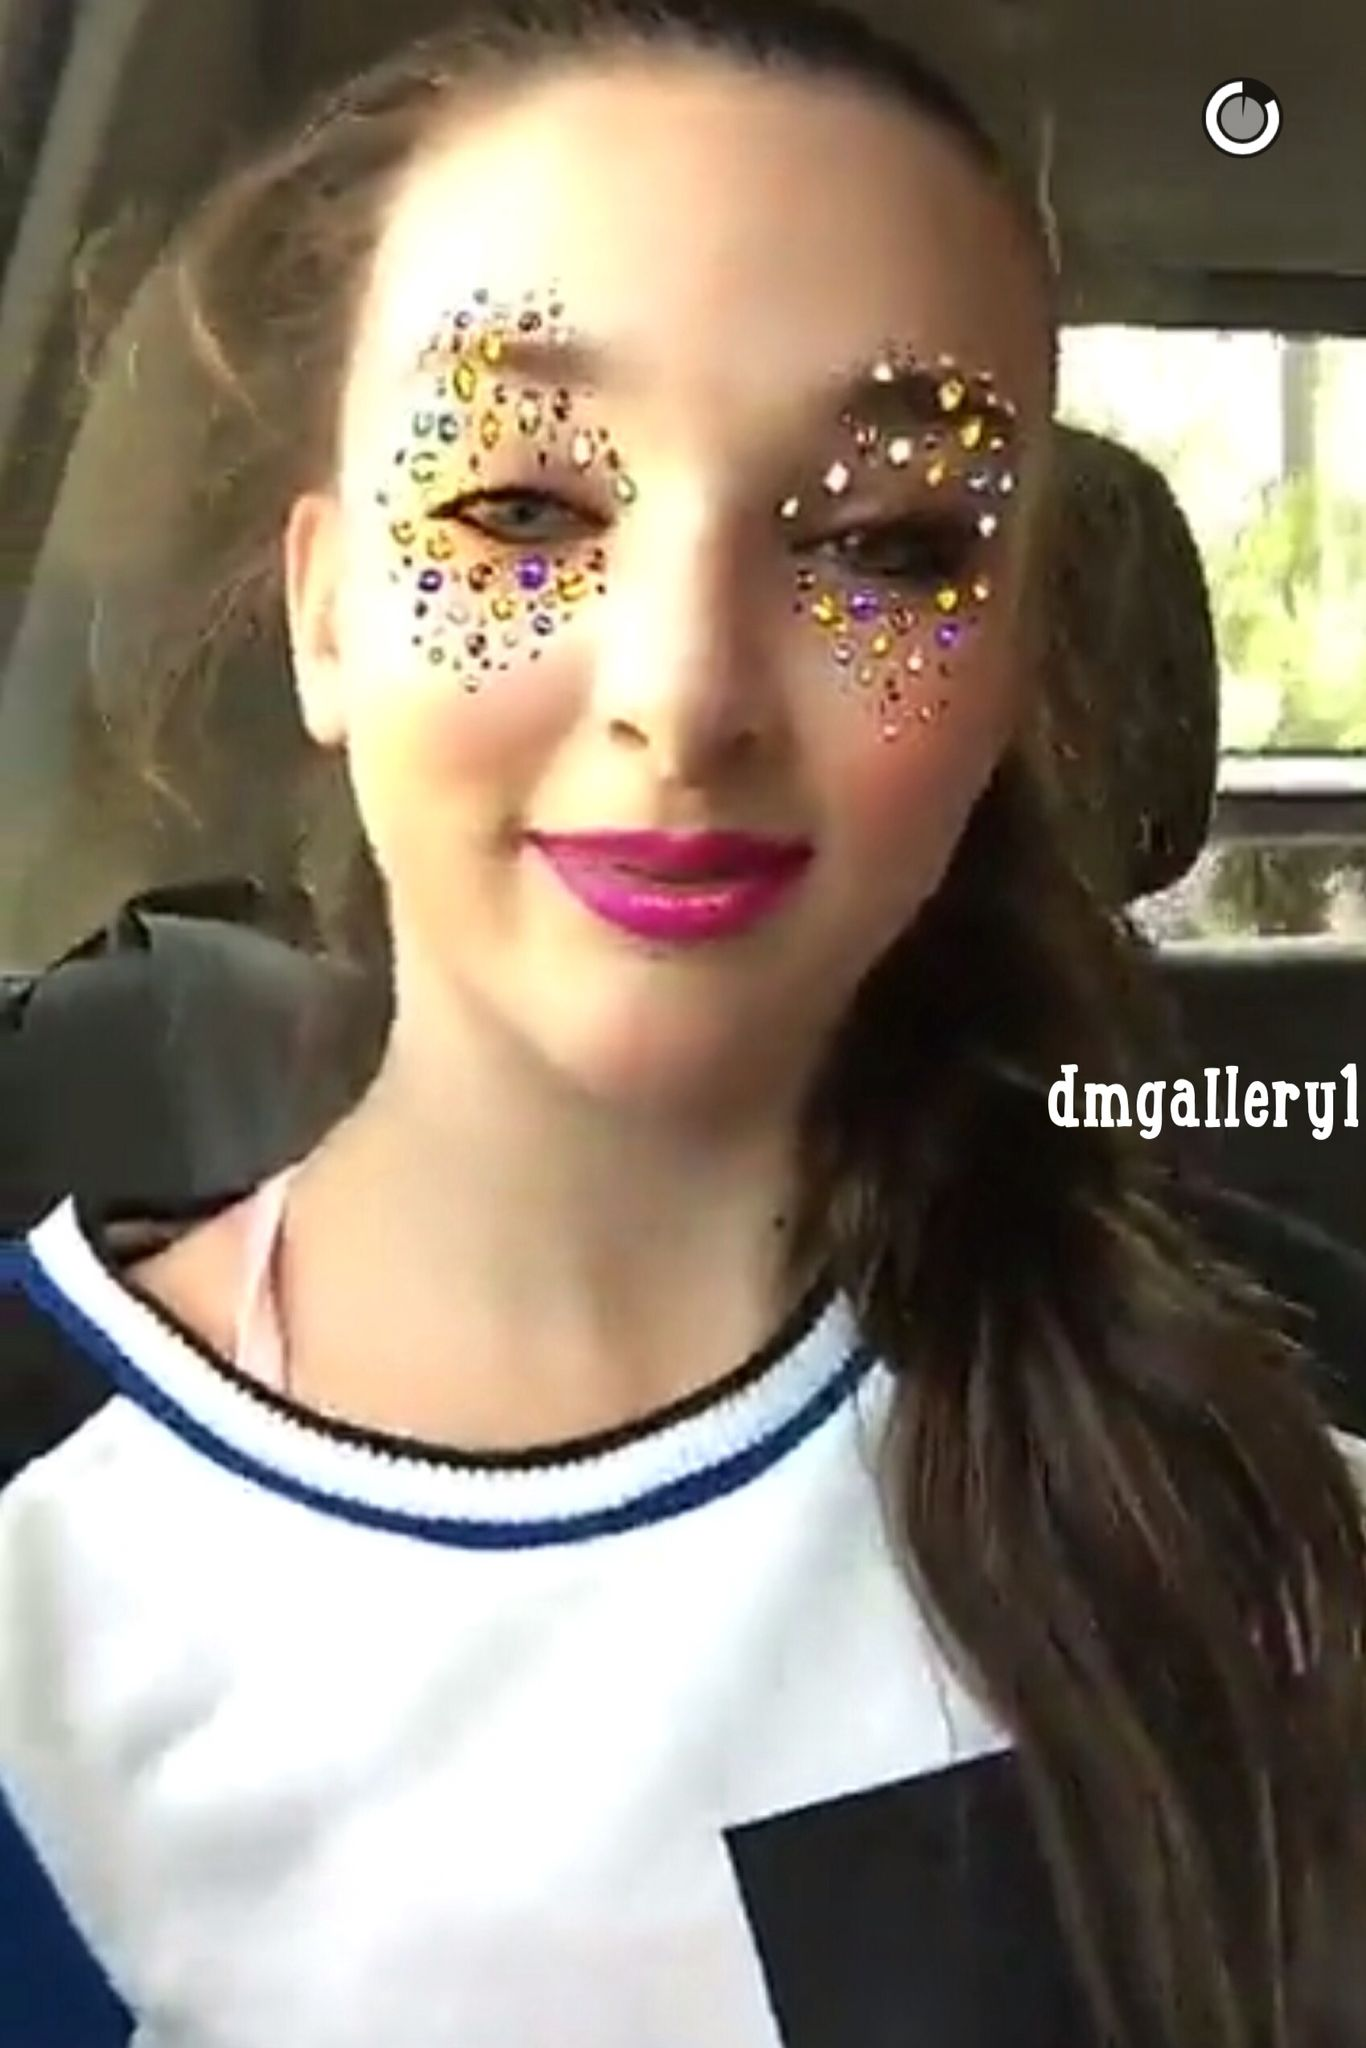 Kendall Vertes' Snapchat [FOLLOW: @dmgallery1] | Kendall ...